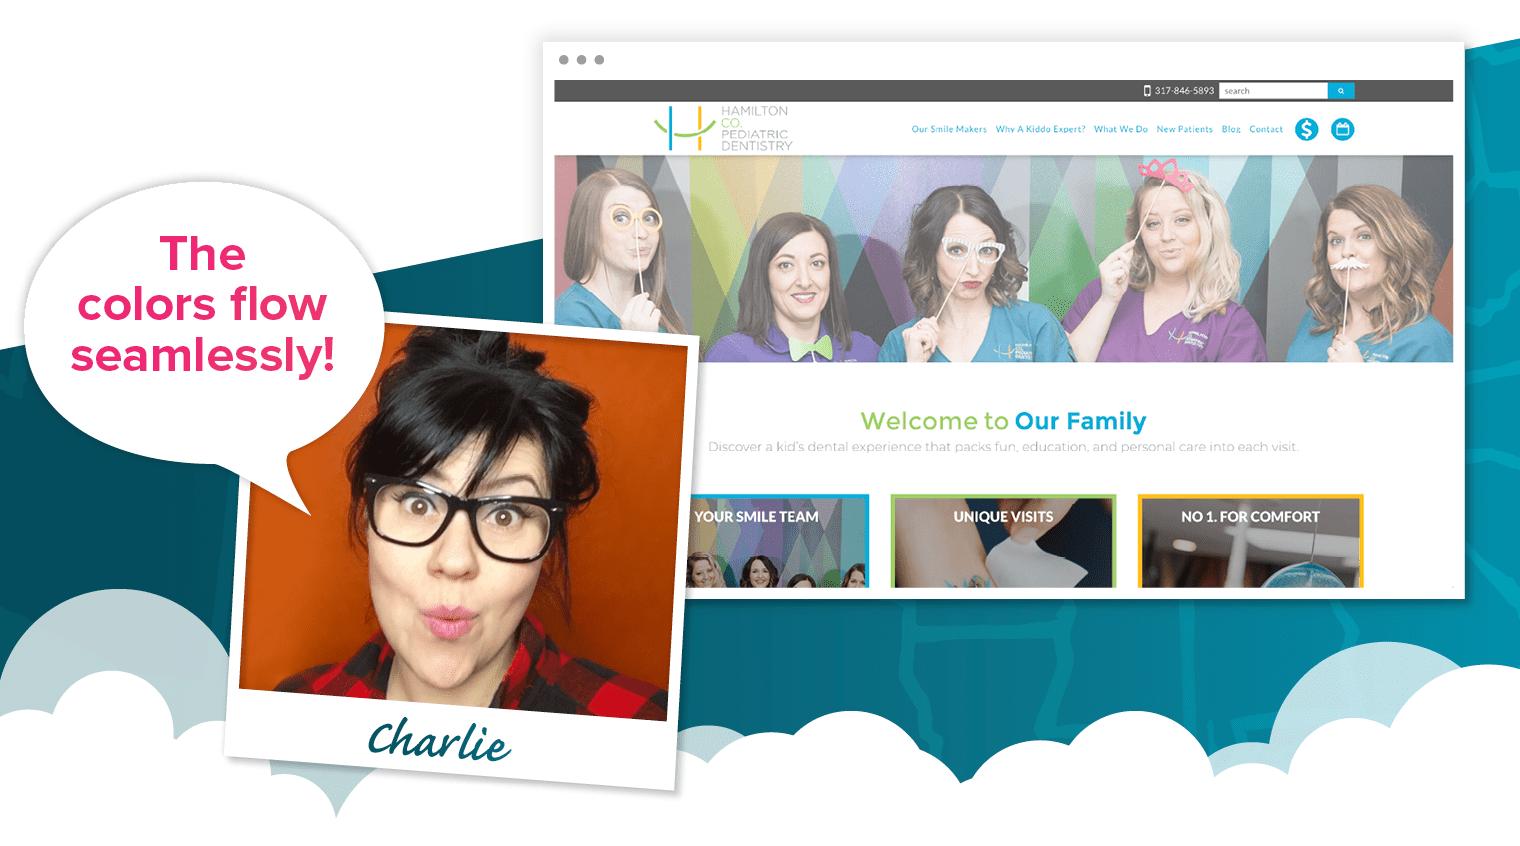 Charlie's pick for one of the best dental websites